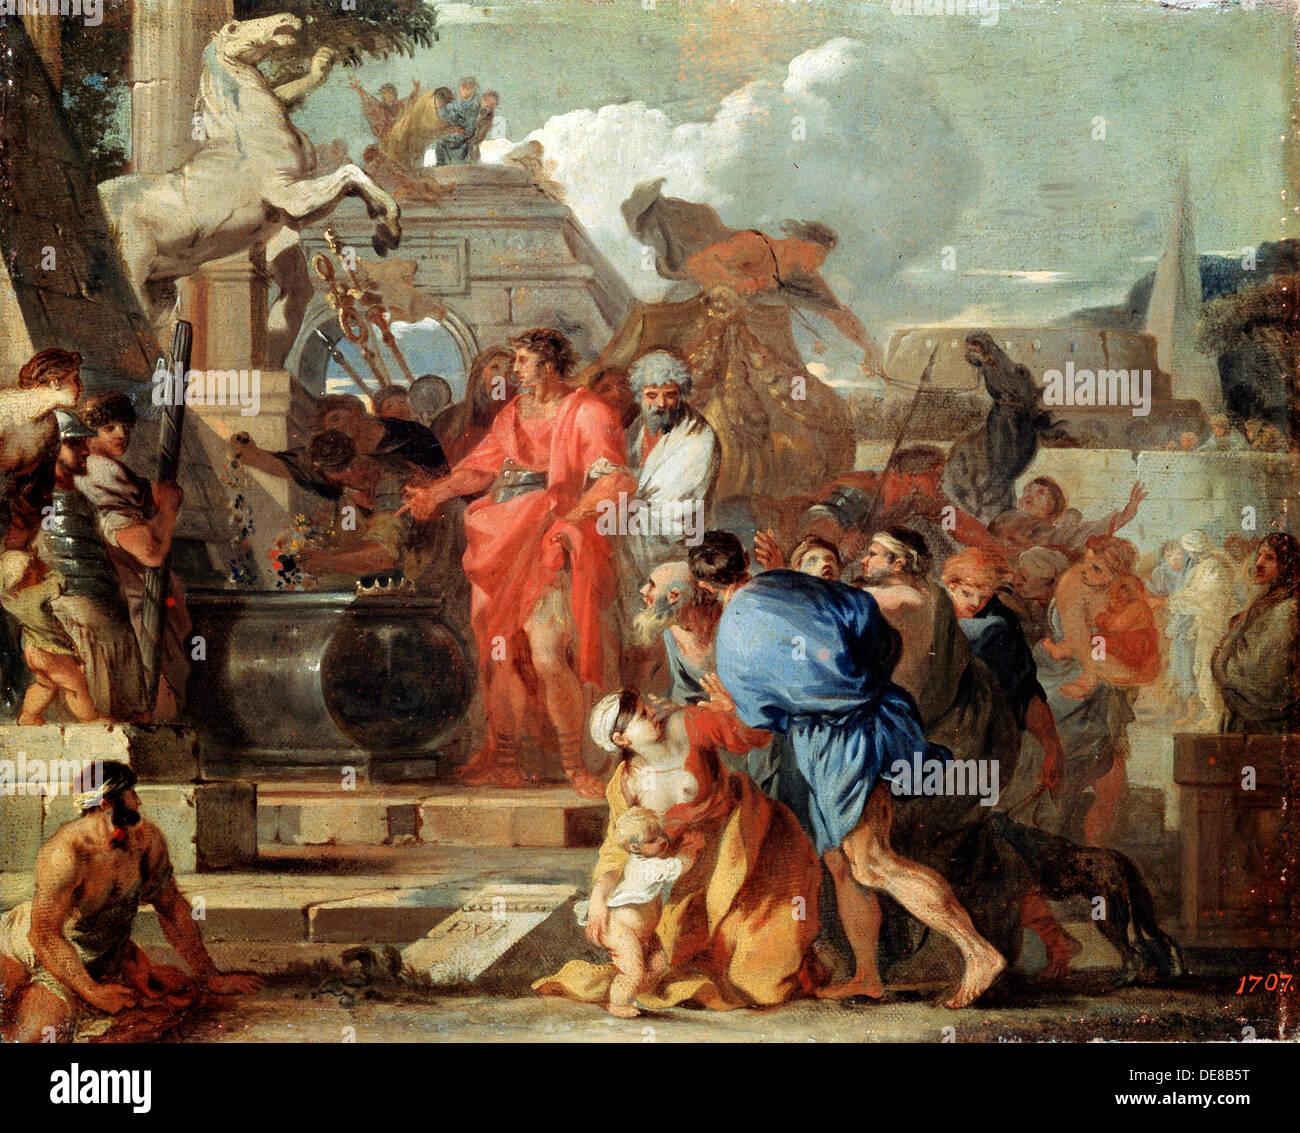 'Augustus before the Tomb of Alexander the Great', 17th century.  Artist: Sébastien Bourdon - Stock Image